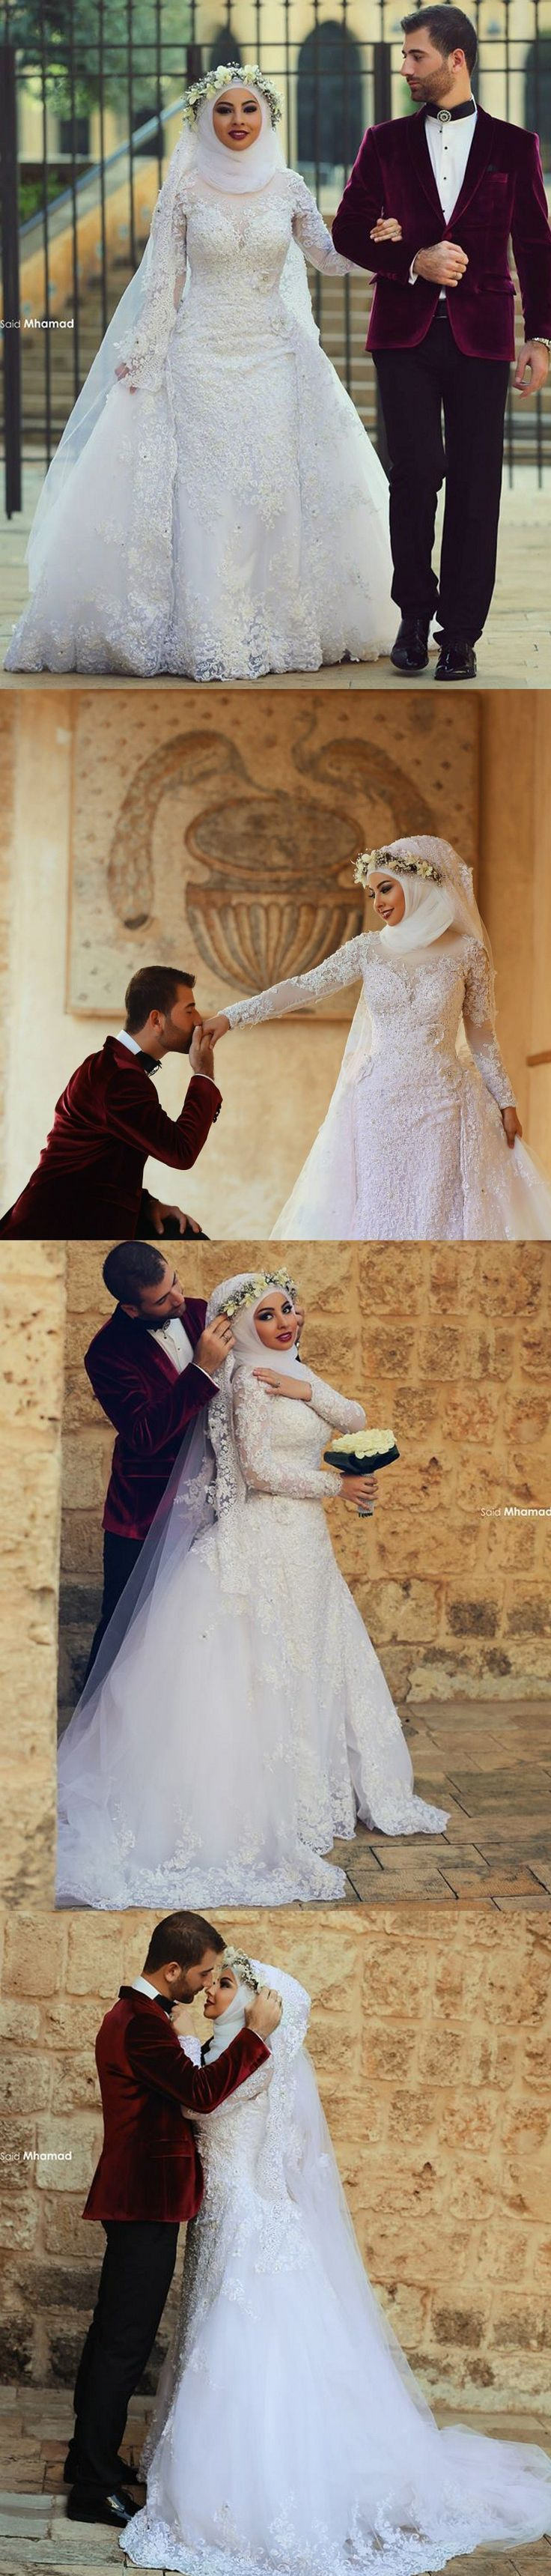 High Neck Islamic Long Sleeve Muslim Wedding Dress Detachable Train Arab Hijab Wedding Dress 2016 Robe De Mariage Musulman